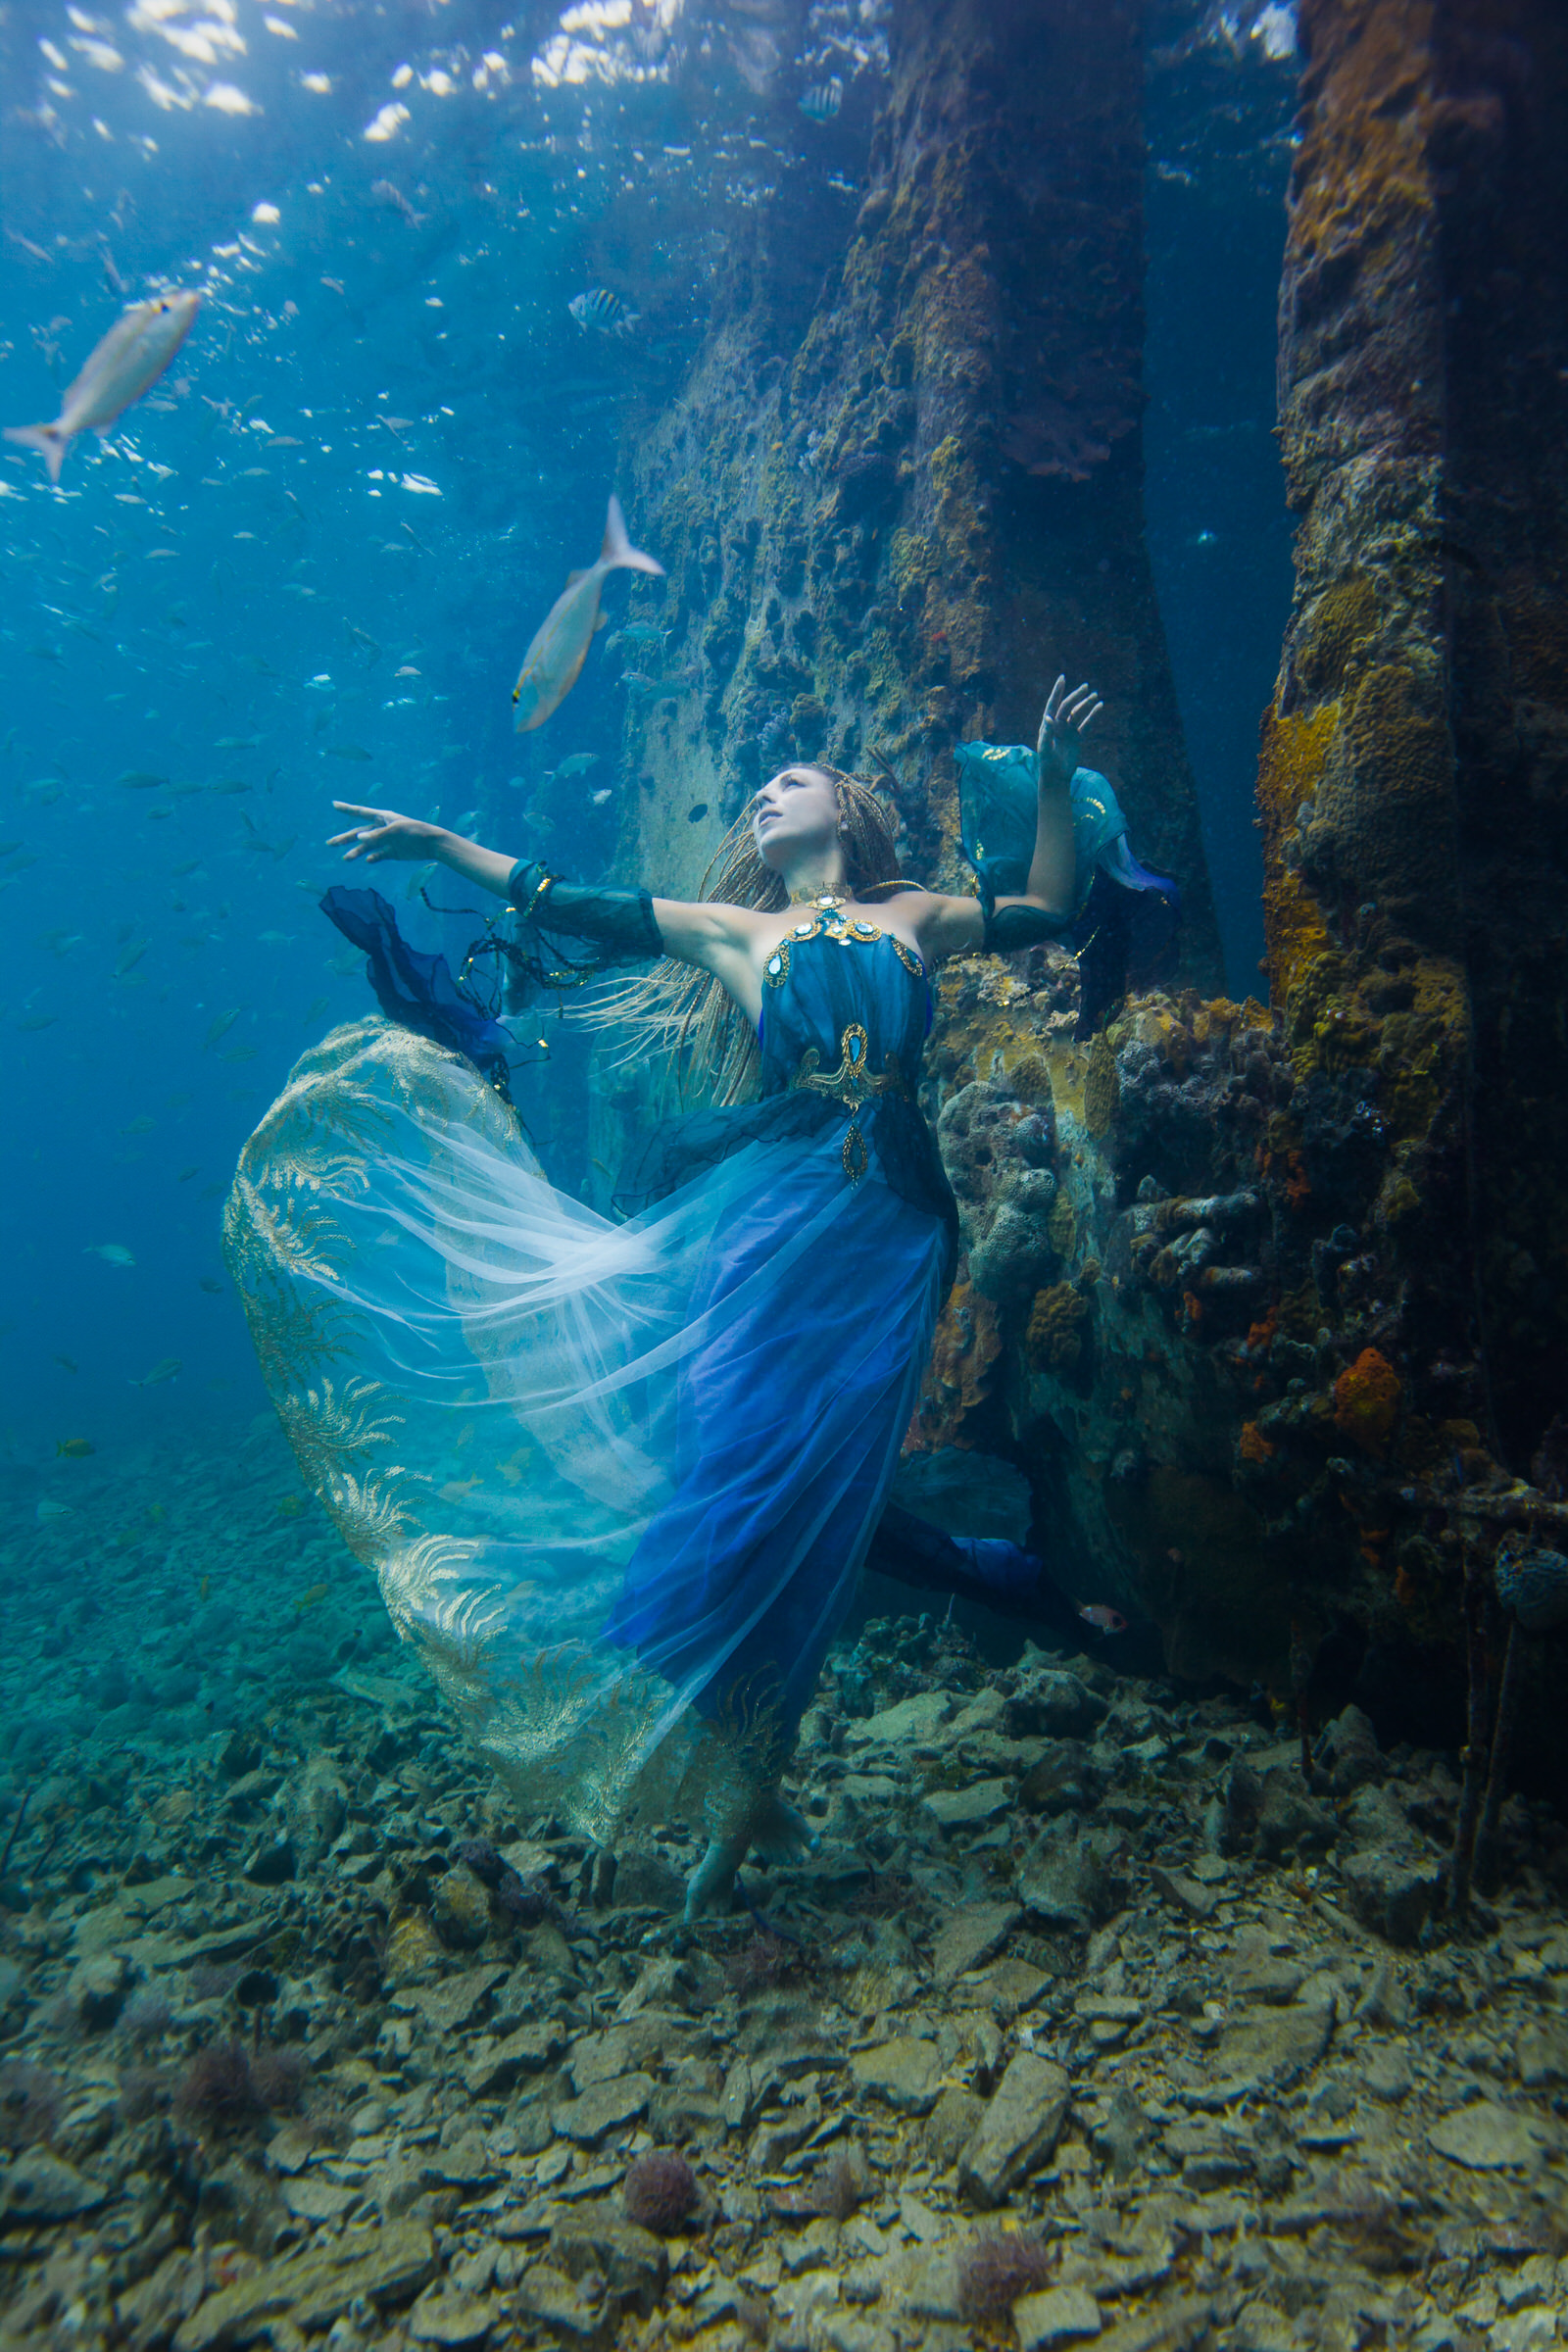 underwater brett stanley photoshoot photographer water mermaid fantasy award lady portrait winning dark sea skin woman advertising ocean mermaids shipwreck